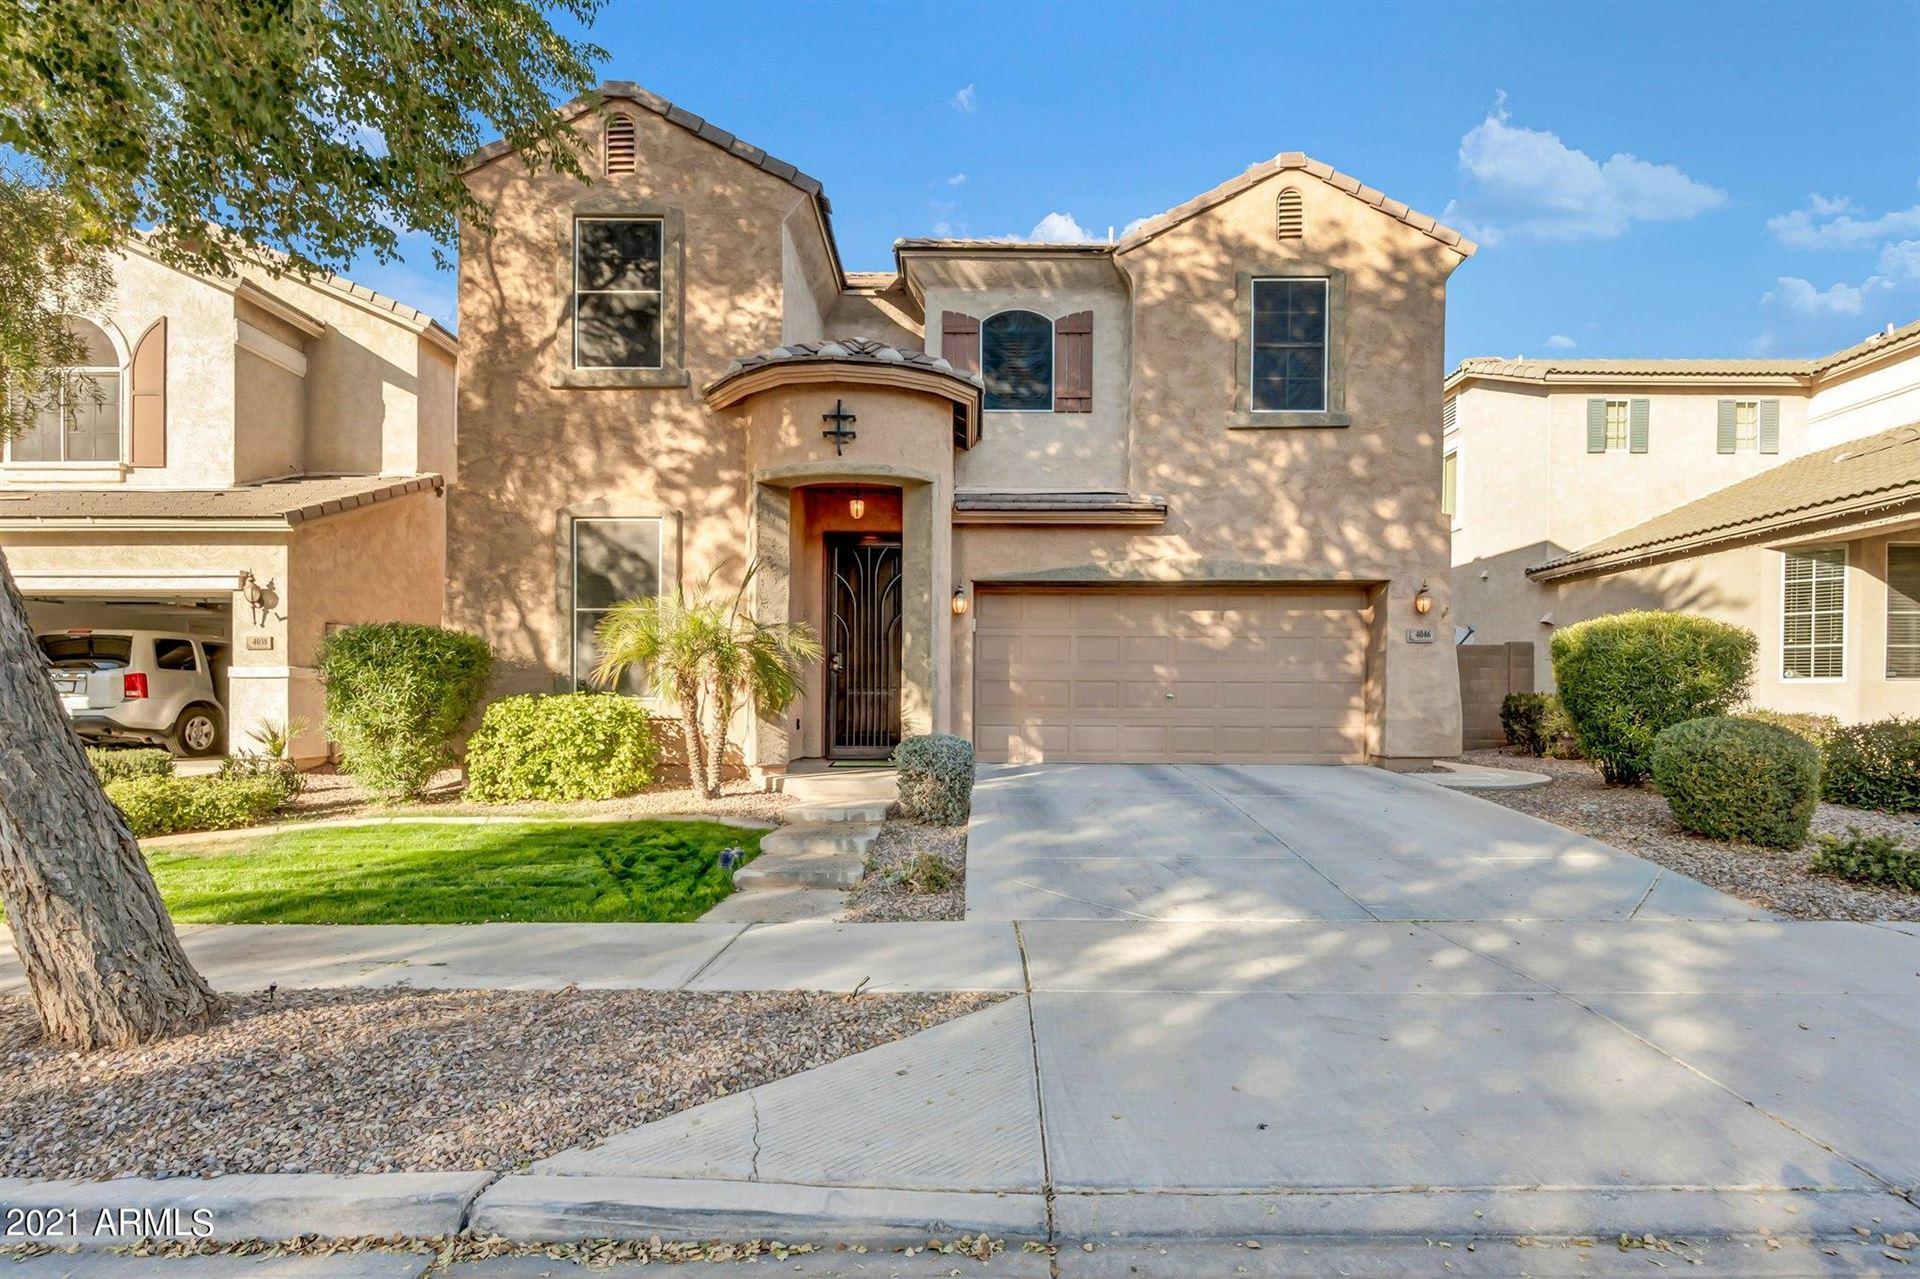 4046 E MILKY Way, Gilbert, AZ 85295 - MLS#: 6181861